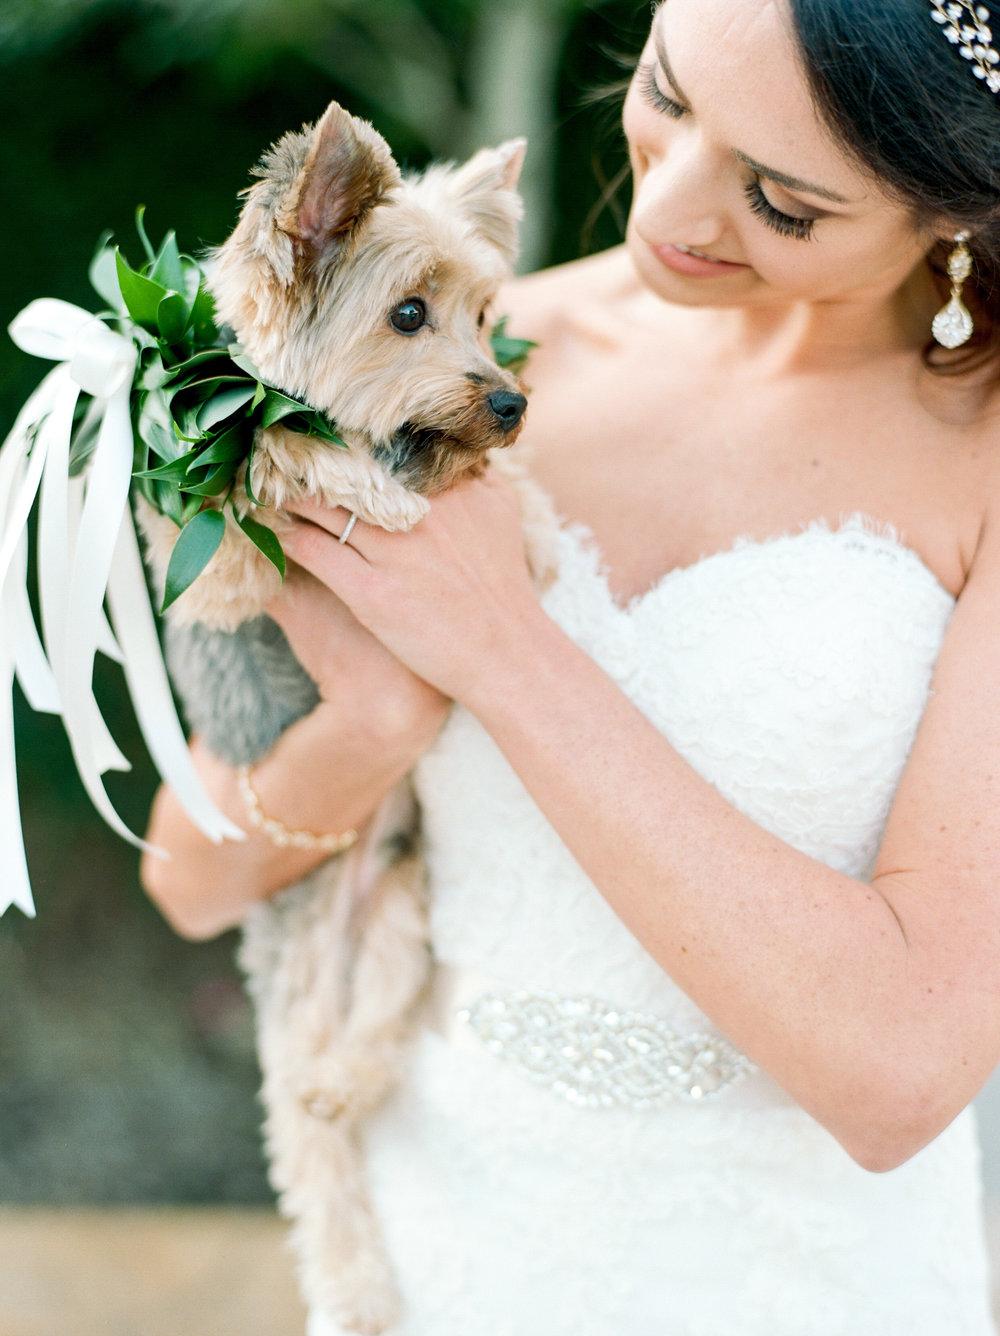 Briscoe-Manor-Houston-Wedding-Photographer-Modern-Luxury-Weddings-Dana-Fernandez-Photograpy-Fine-Art-Photographer-Houston-Film-Destination-PNW-Wedding-Photographer-27.jpg